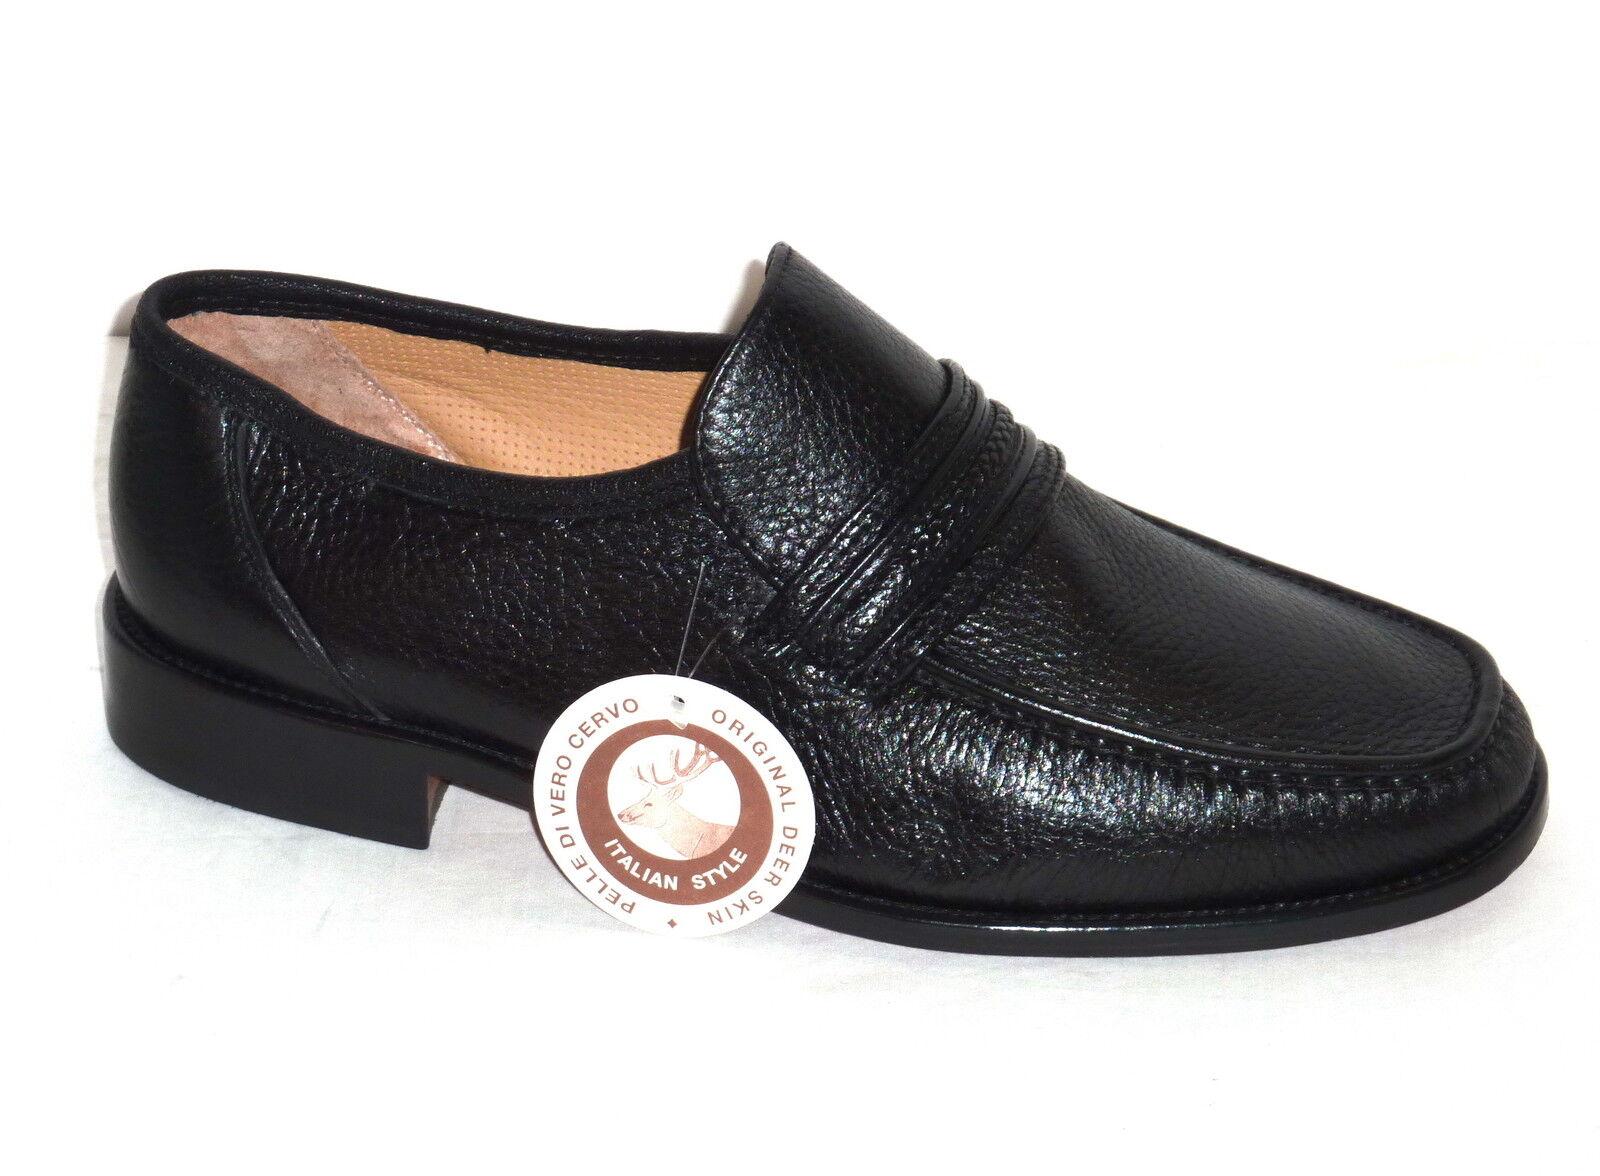 U4208H MELLUSO chaussures hommes MOCASSINI PELLE CERVO noir MODA COMODA n. 40